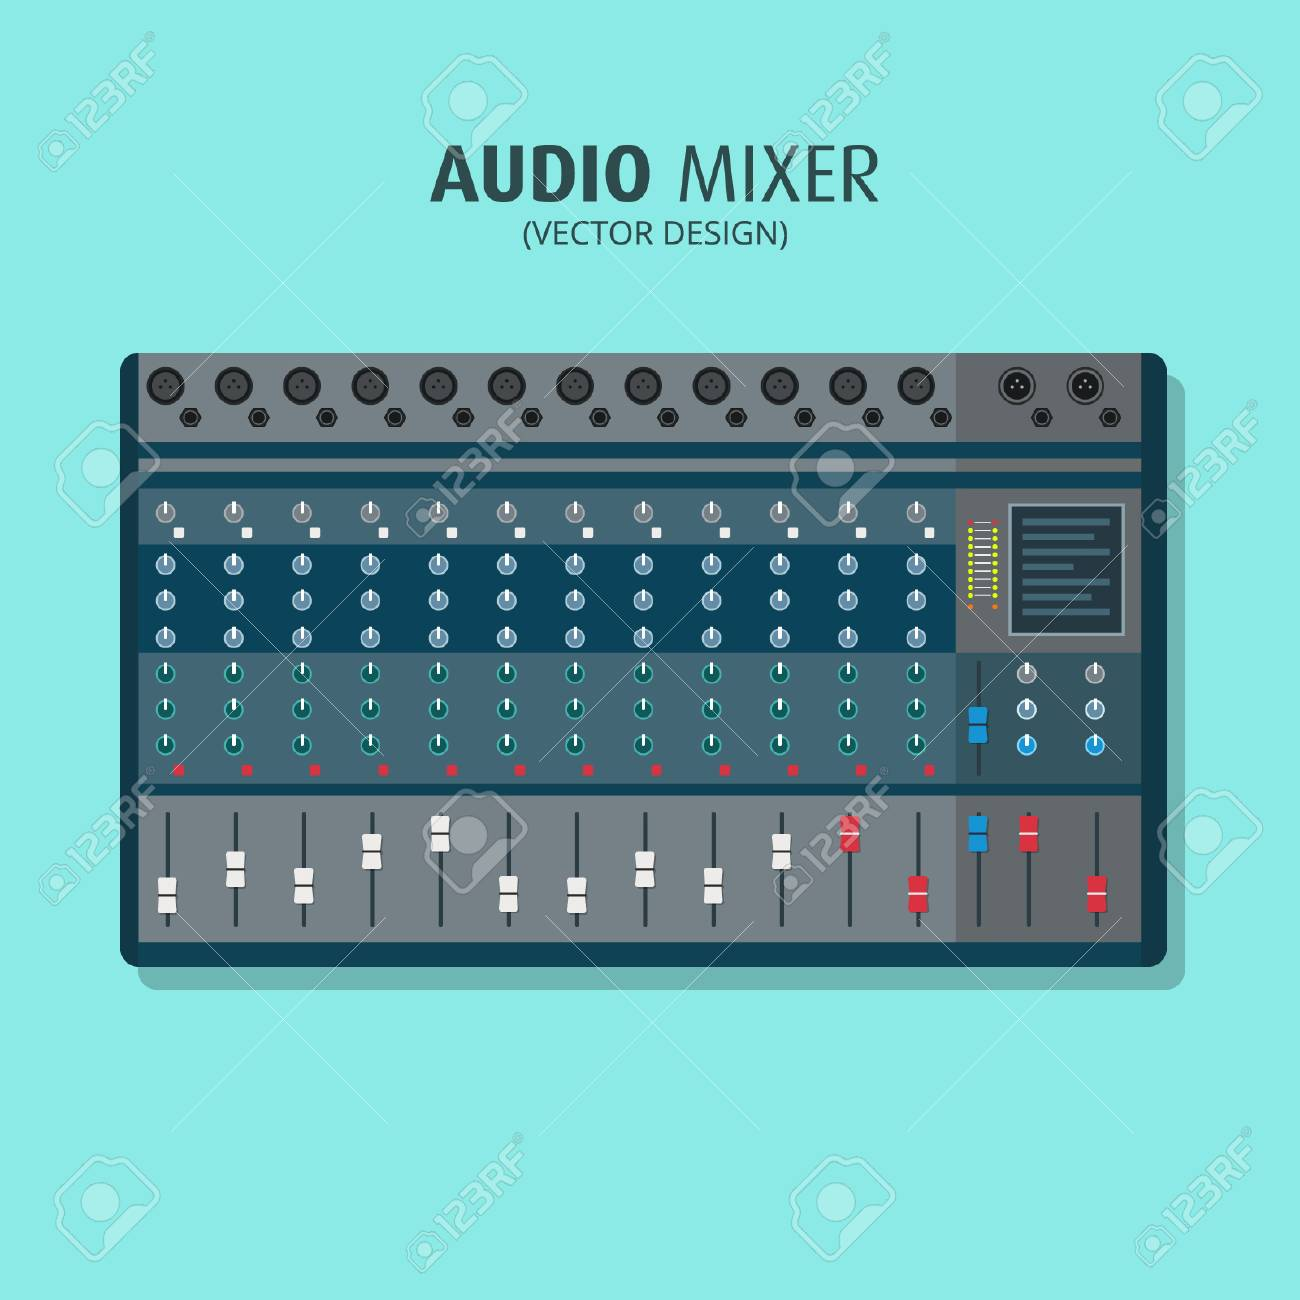 Audio Mixer - Vector Design - 110619549